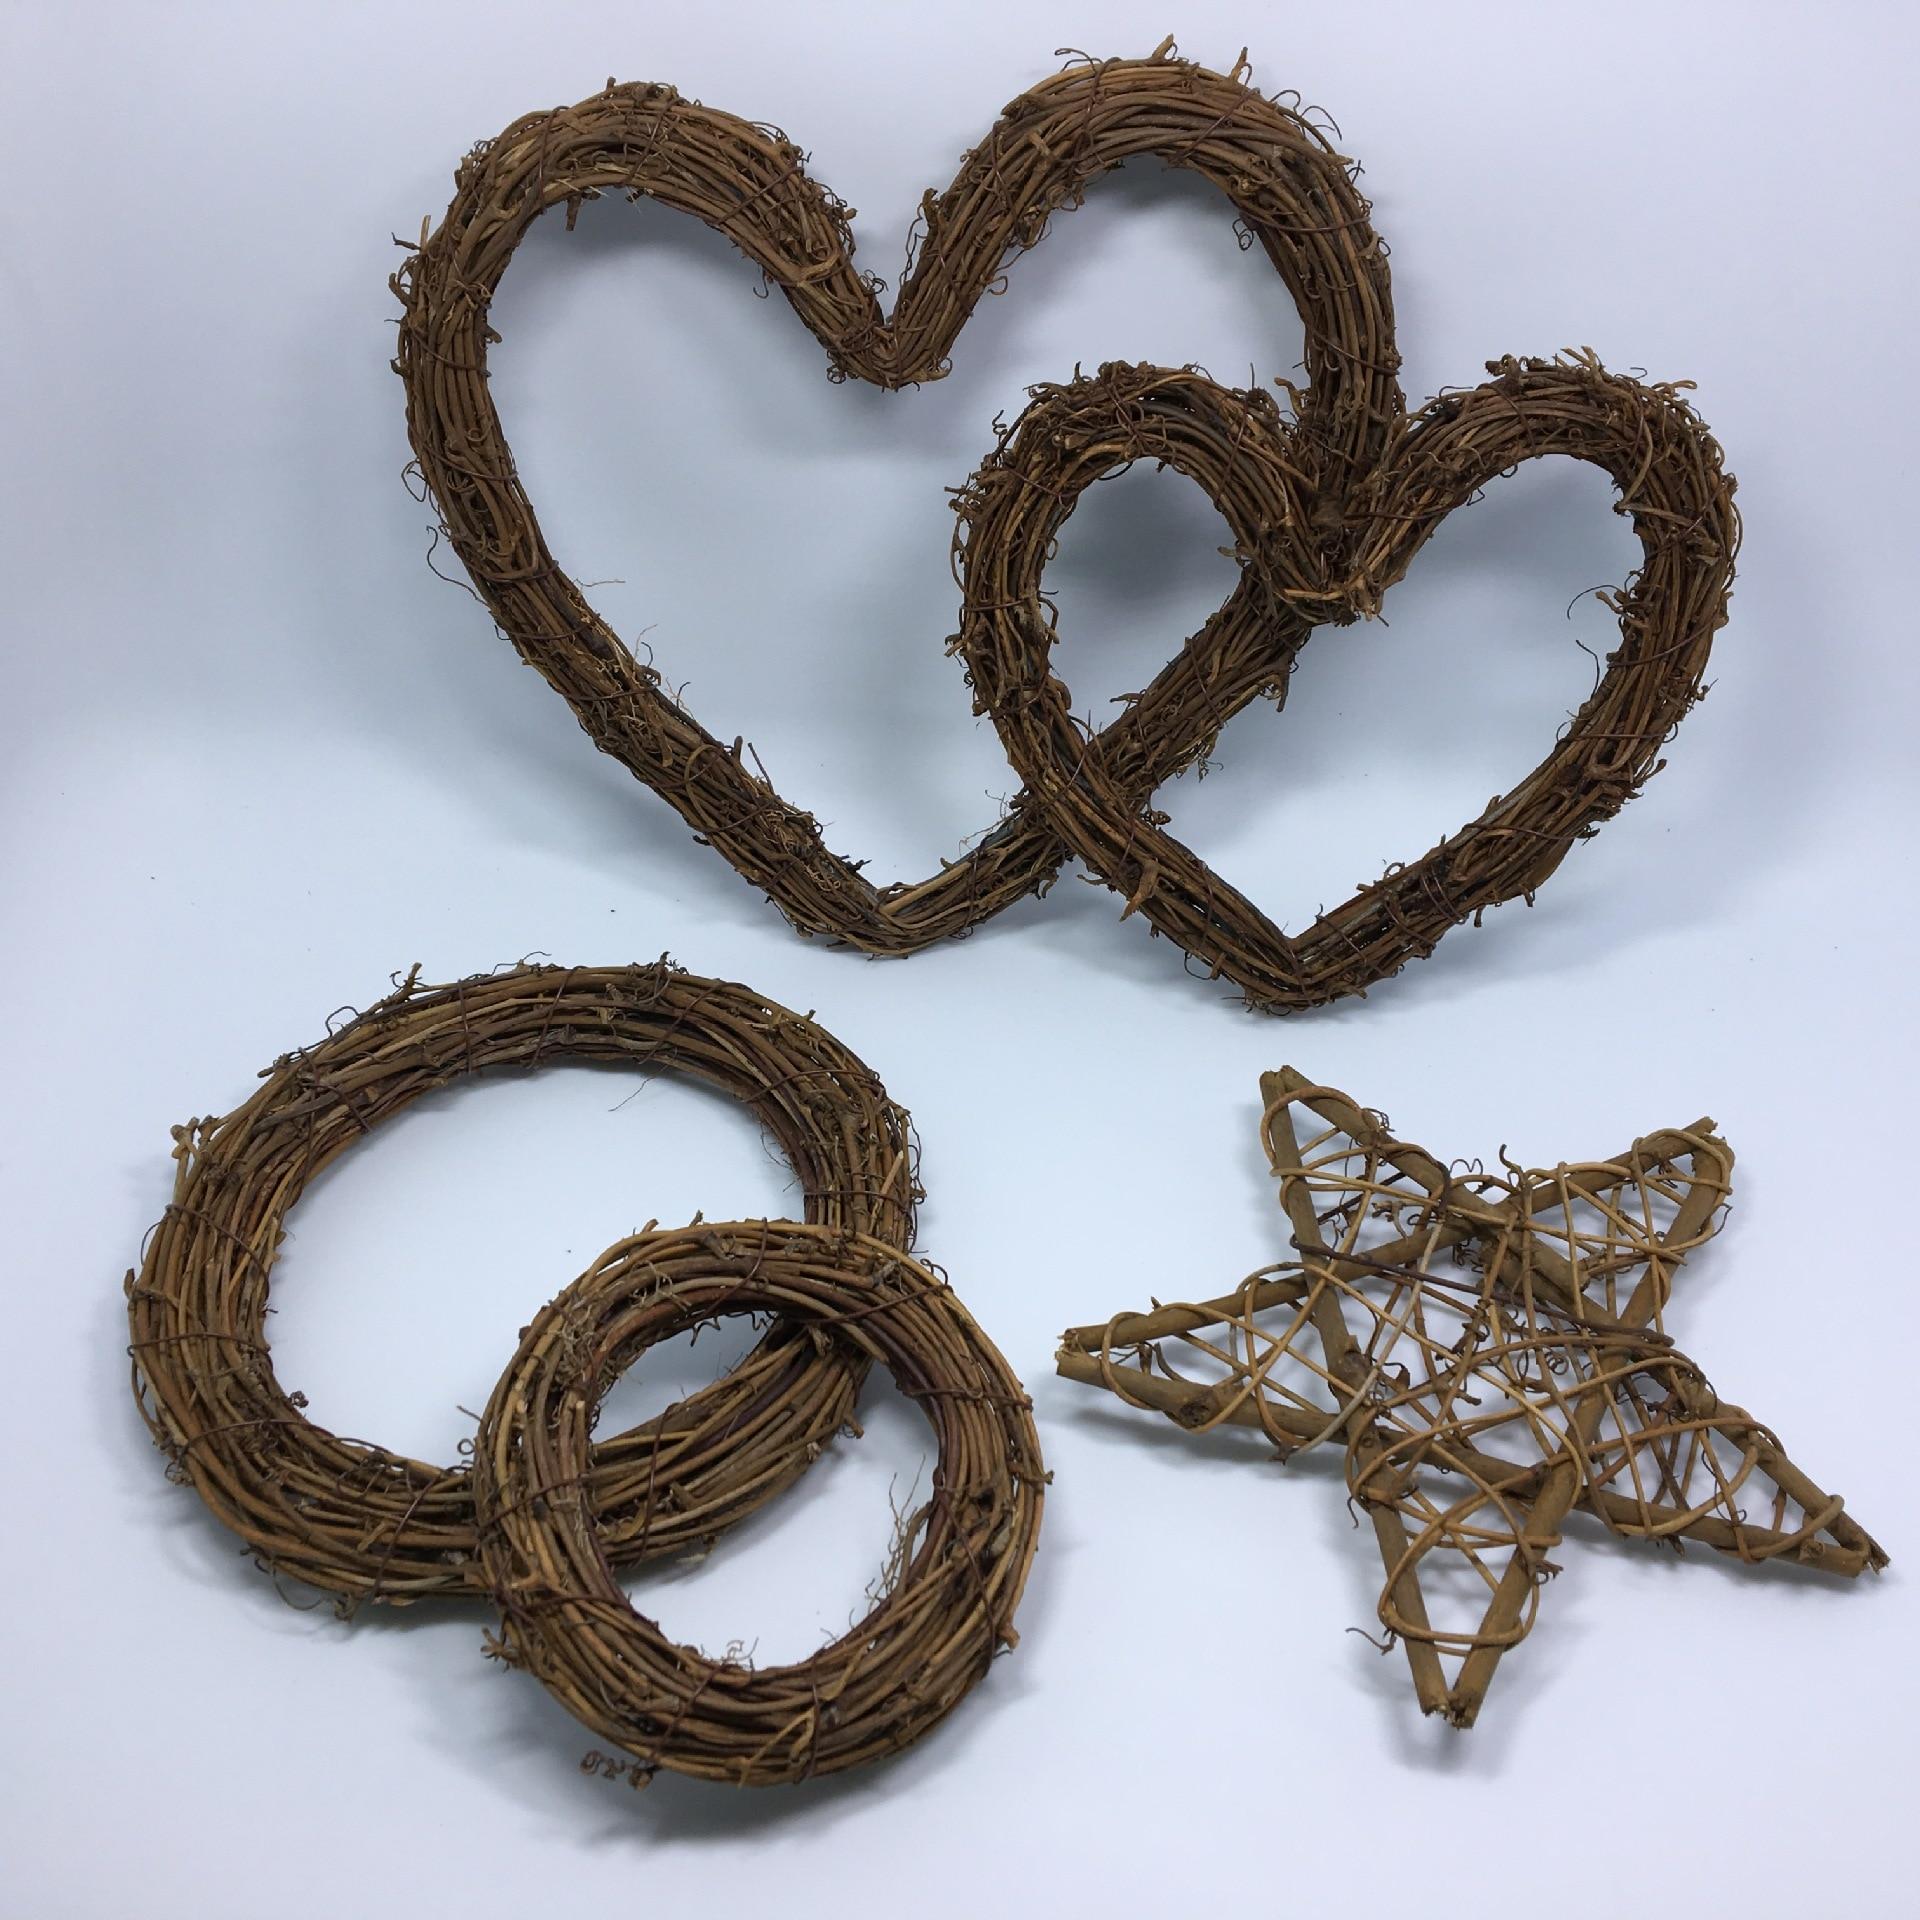 Anillo de mimbre de estrella redonda de corazón, guirnalda de flores artificiales, marco de flores secas para decoración del hogar de Navidad, flores para boda DIY, coronas